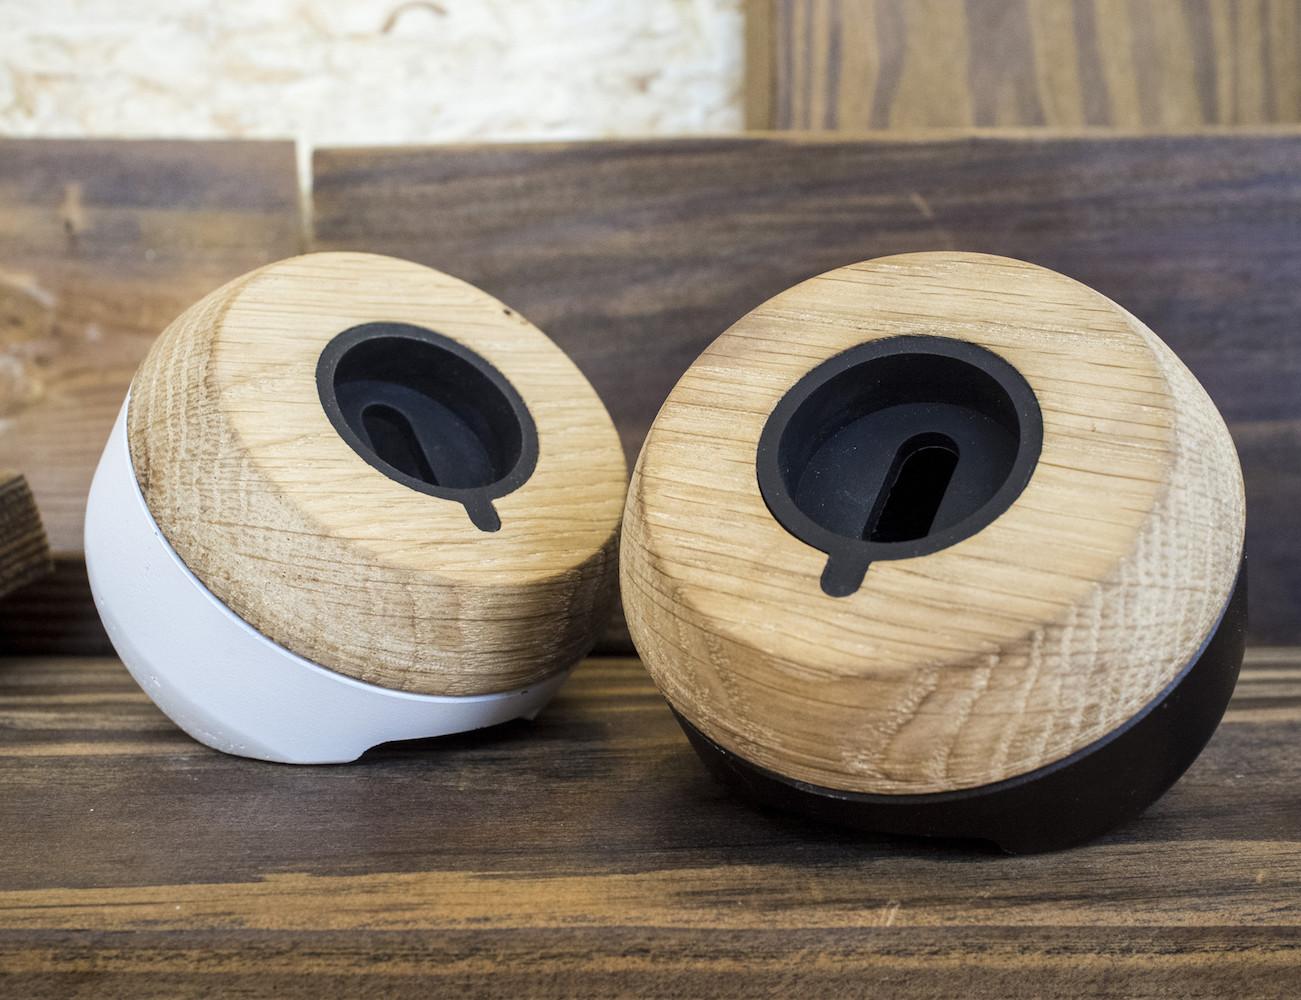 chestnut-smartwatch-dock-from-enveo-01